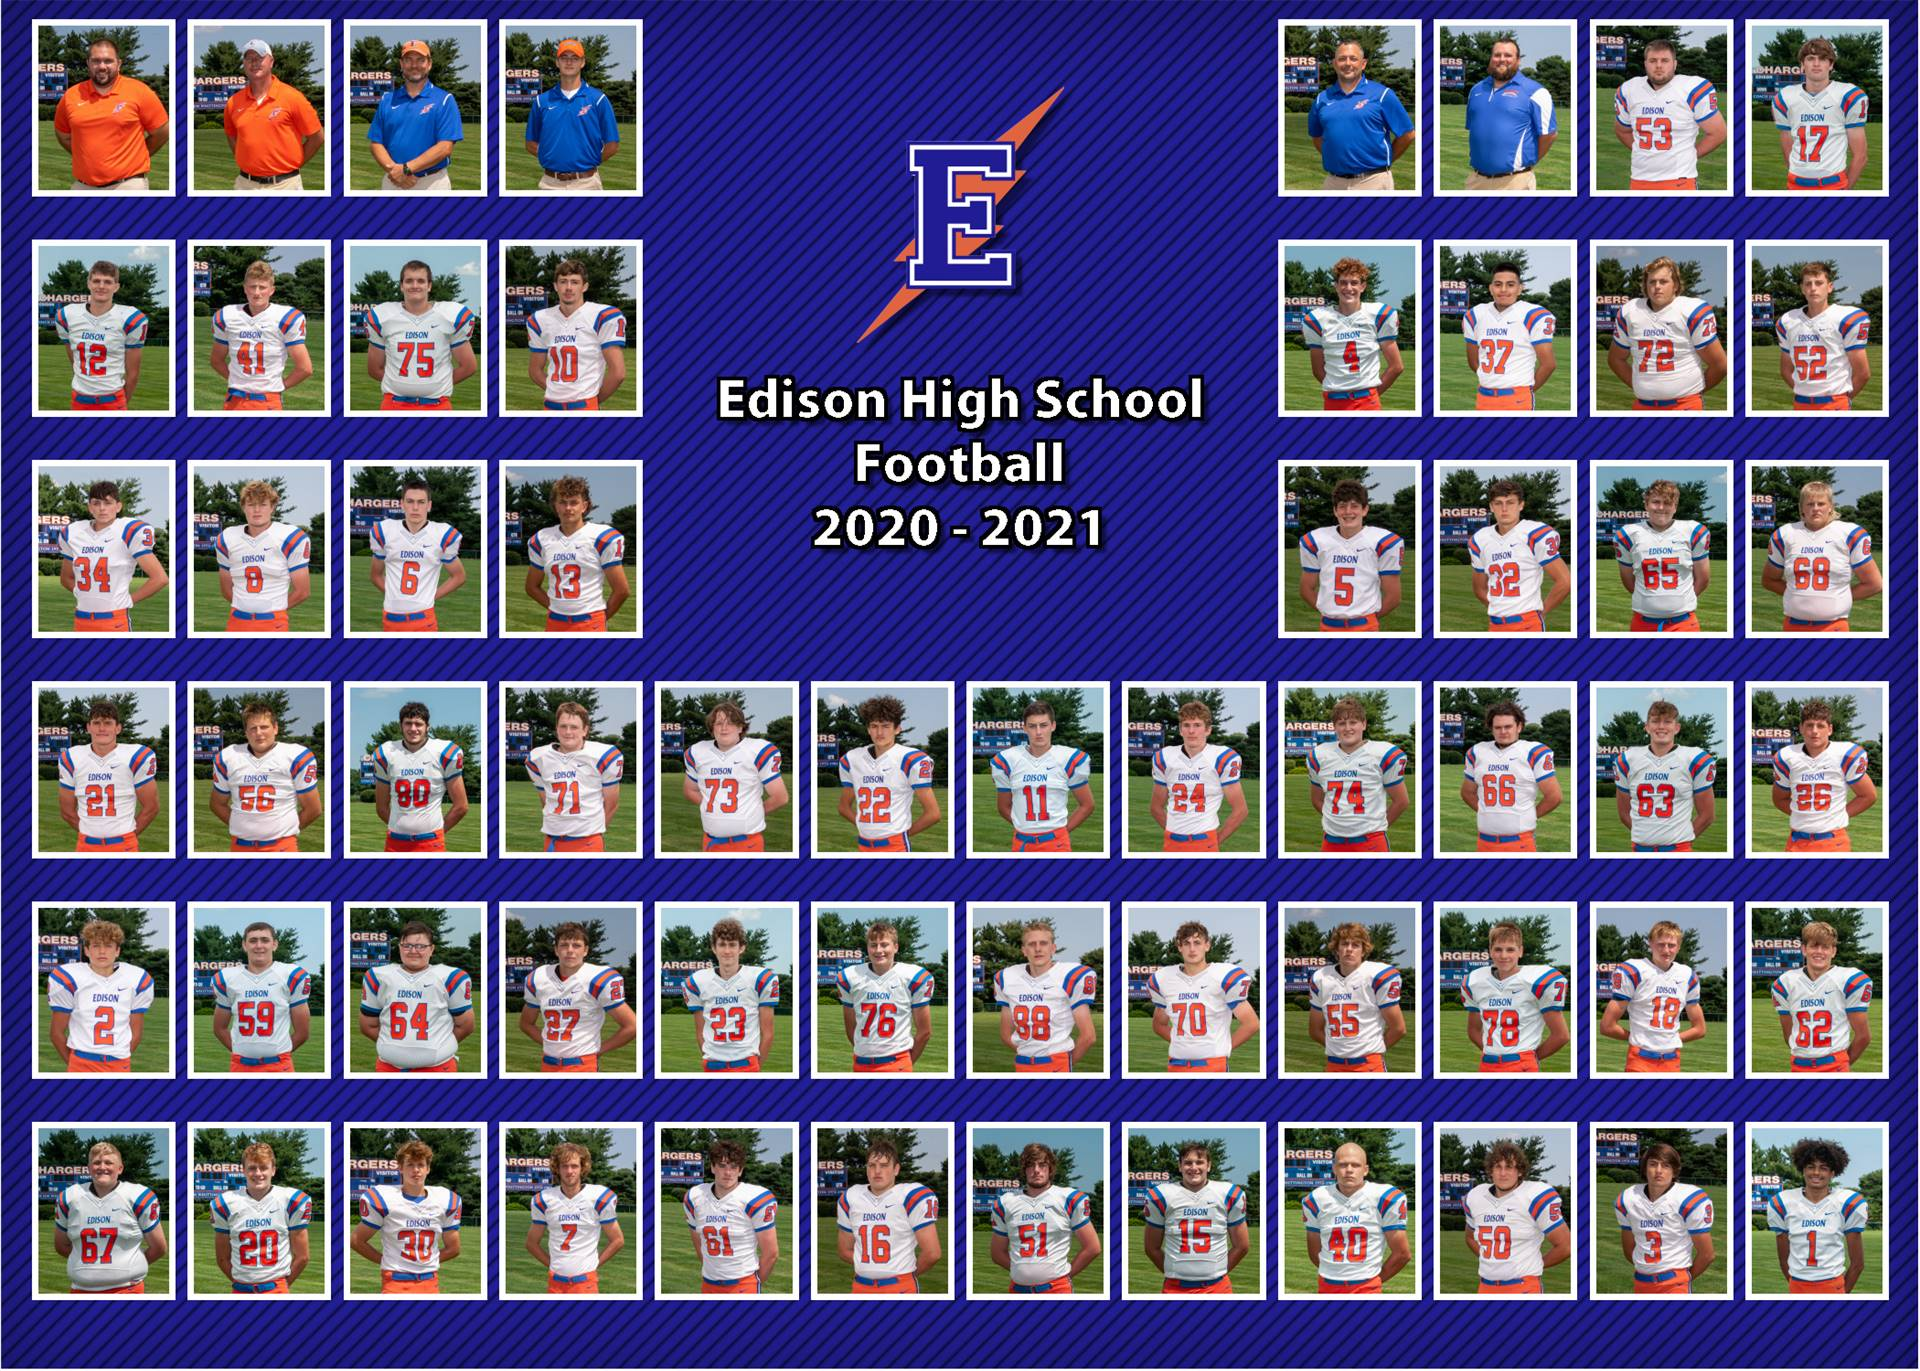 2020 Football Team Photo